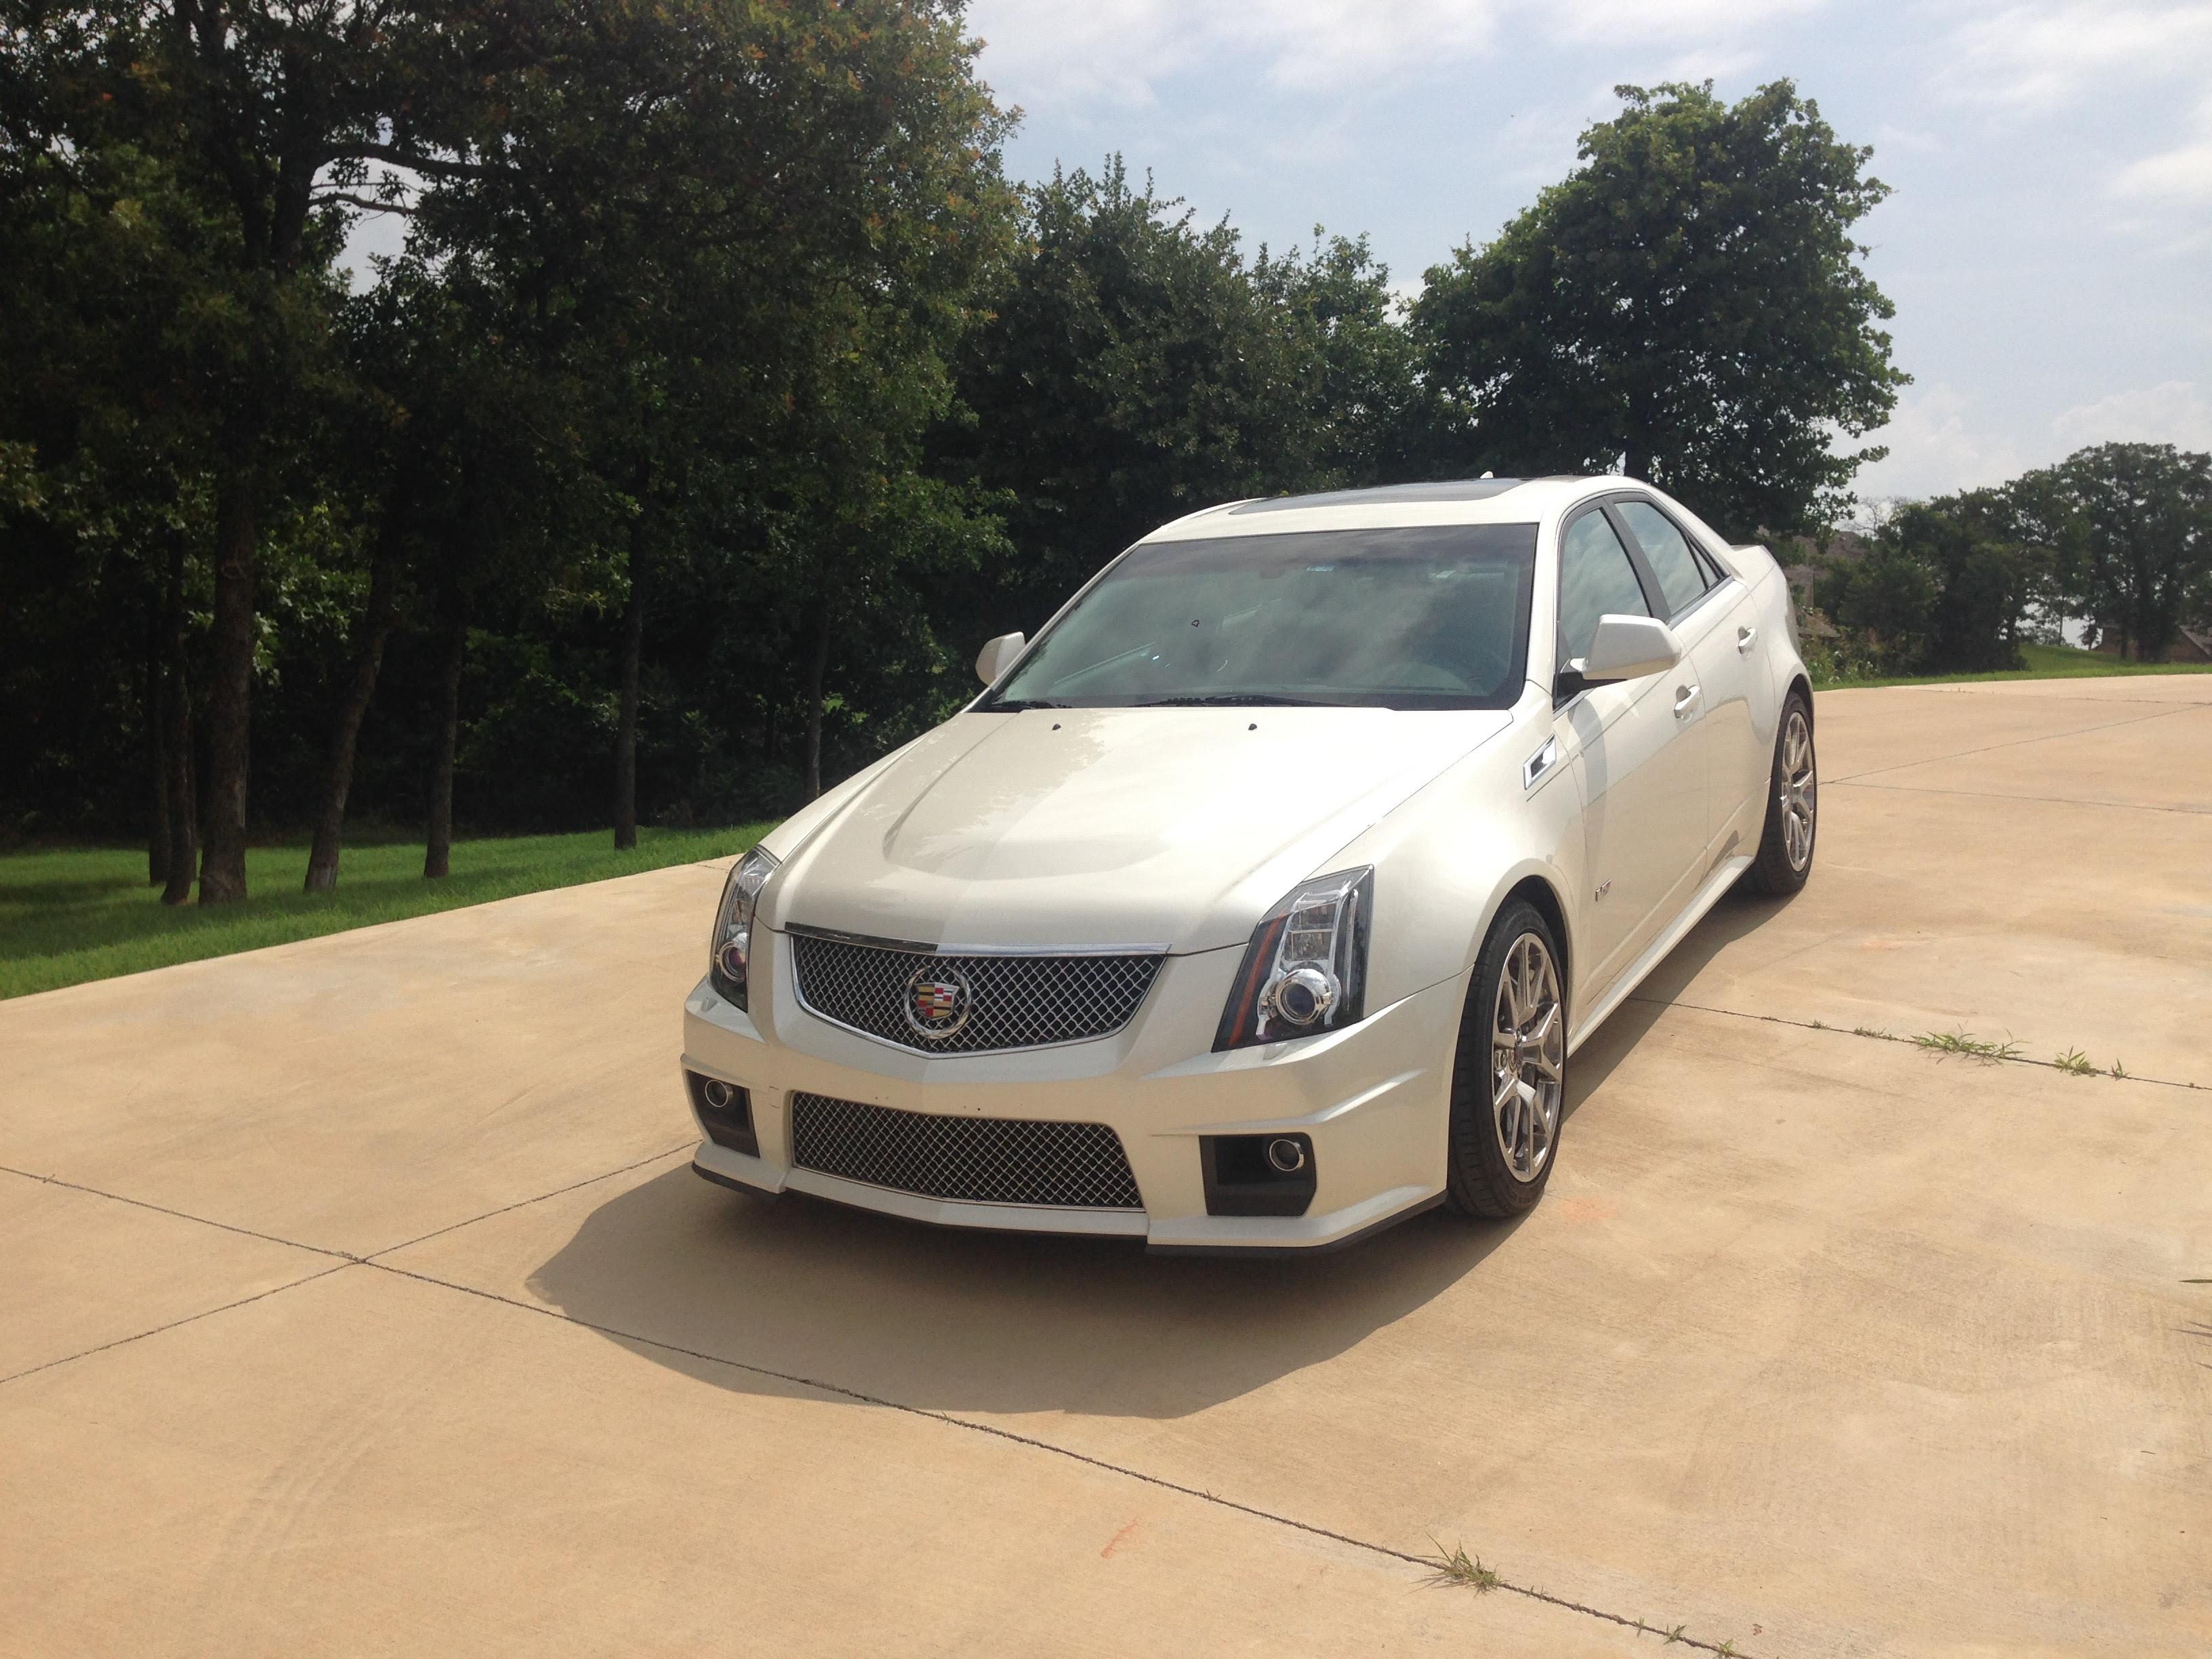 2012 Cadillac CTS V White Diamond Sedan - LS1TECH